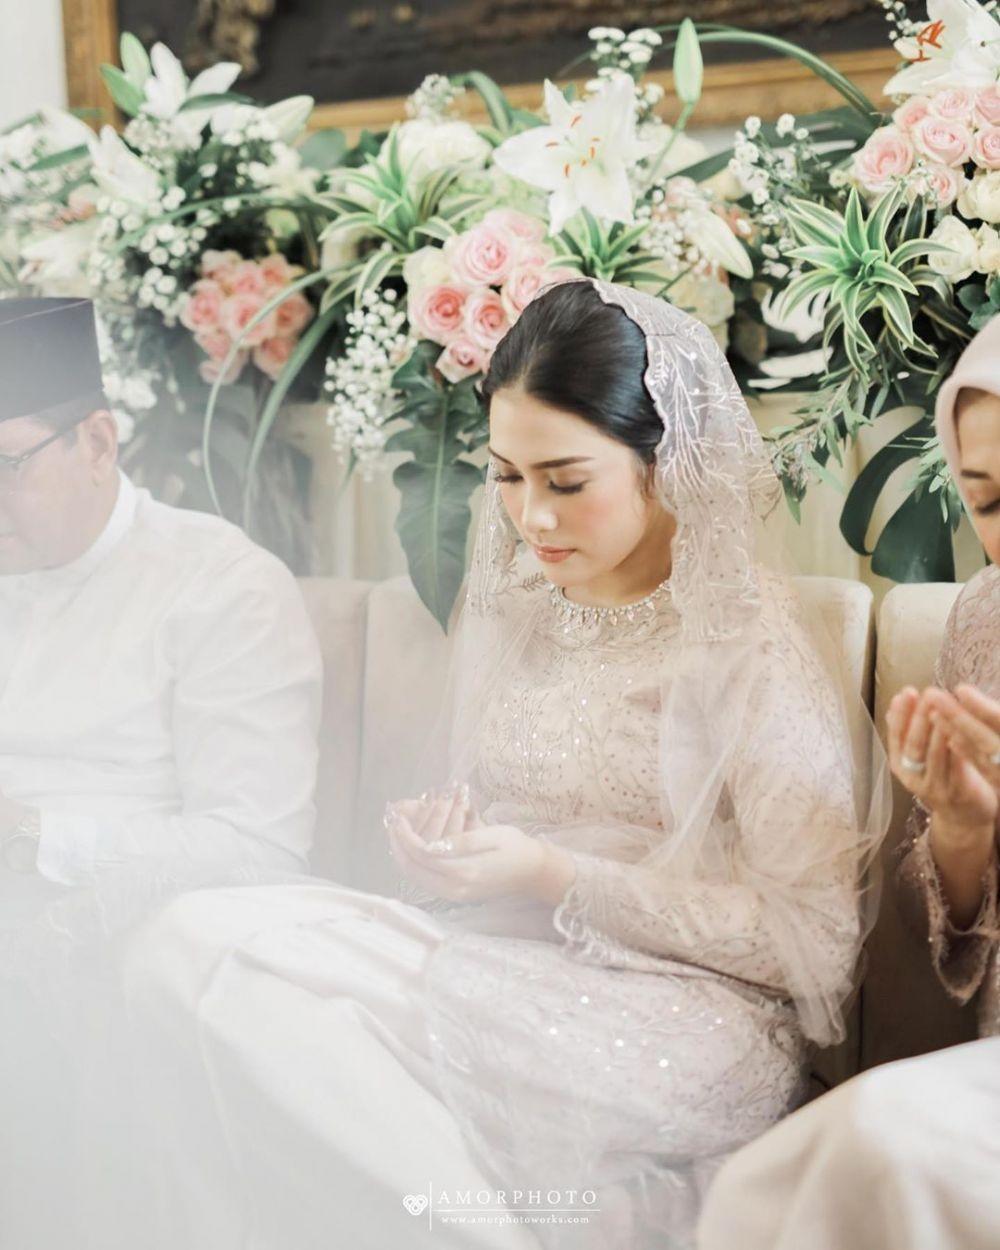 Sah! 10 Momen Haru nan Bahagia Pernikahan Andania Suri danIsdananto